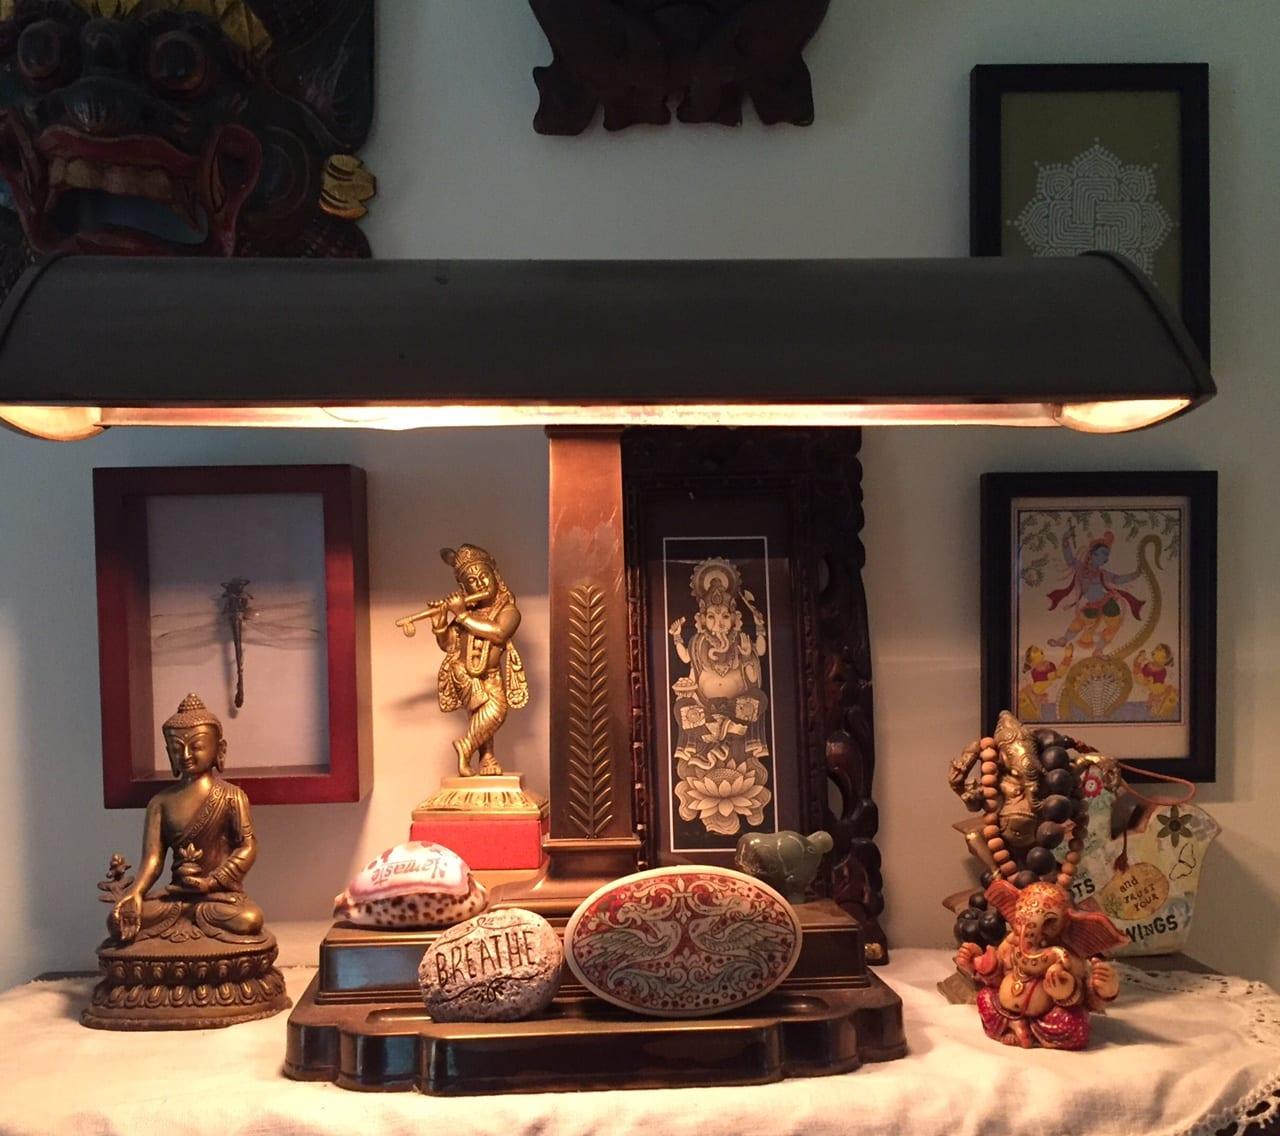 Basil Jones's altar